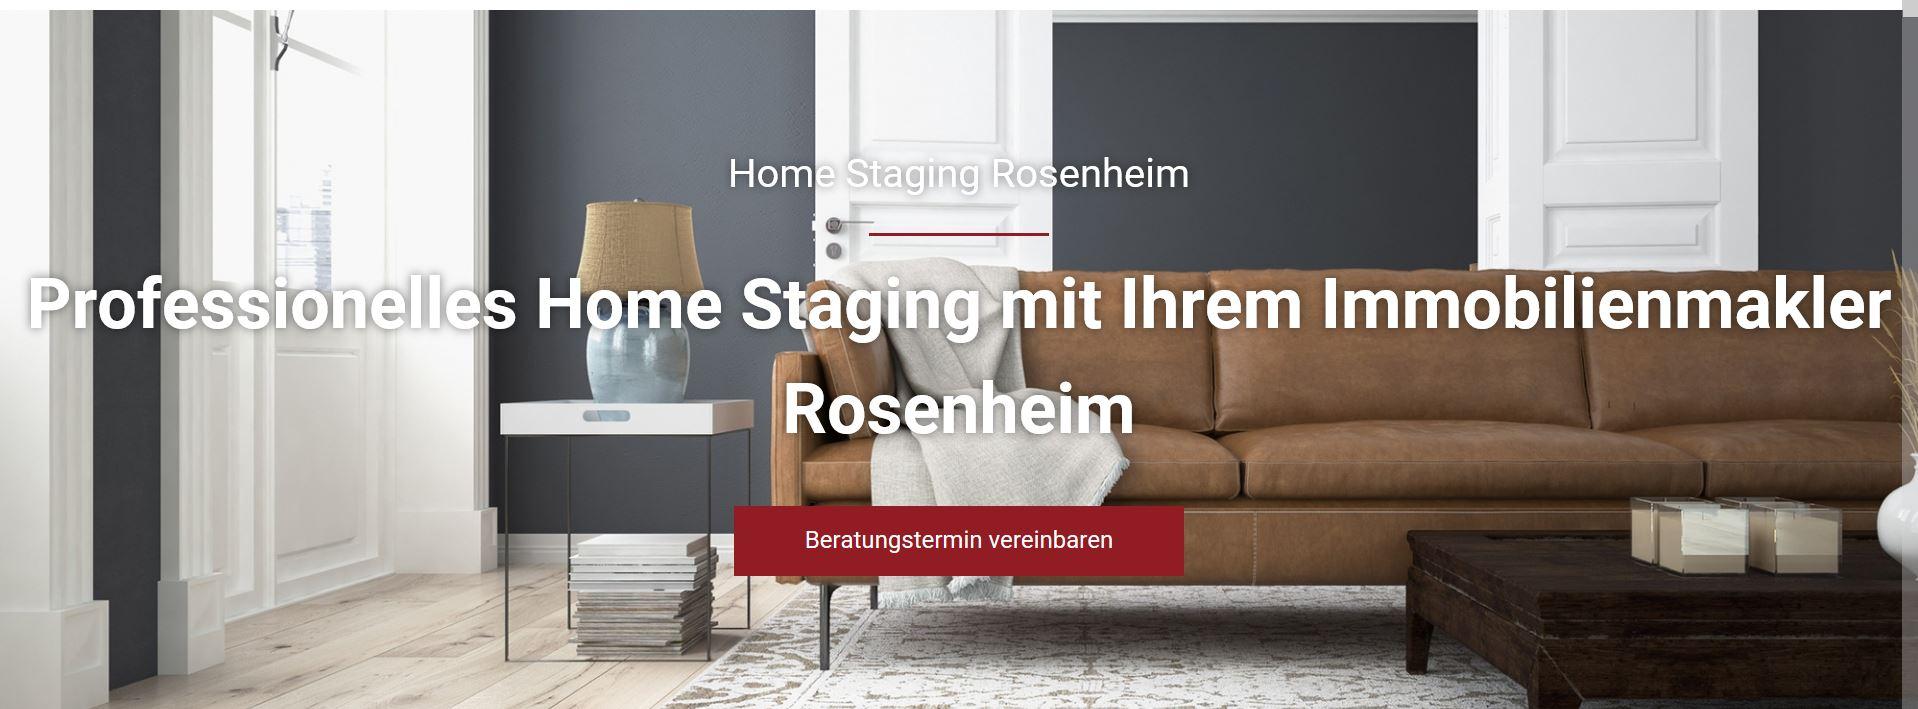 alpina immobilien gmbh immobilien agenturen rosenheim deutschland tel 0803133. Black Bedroom Furniture Sets. Home Design Ideas